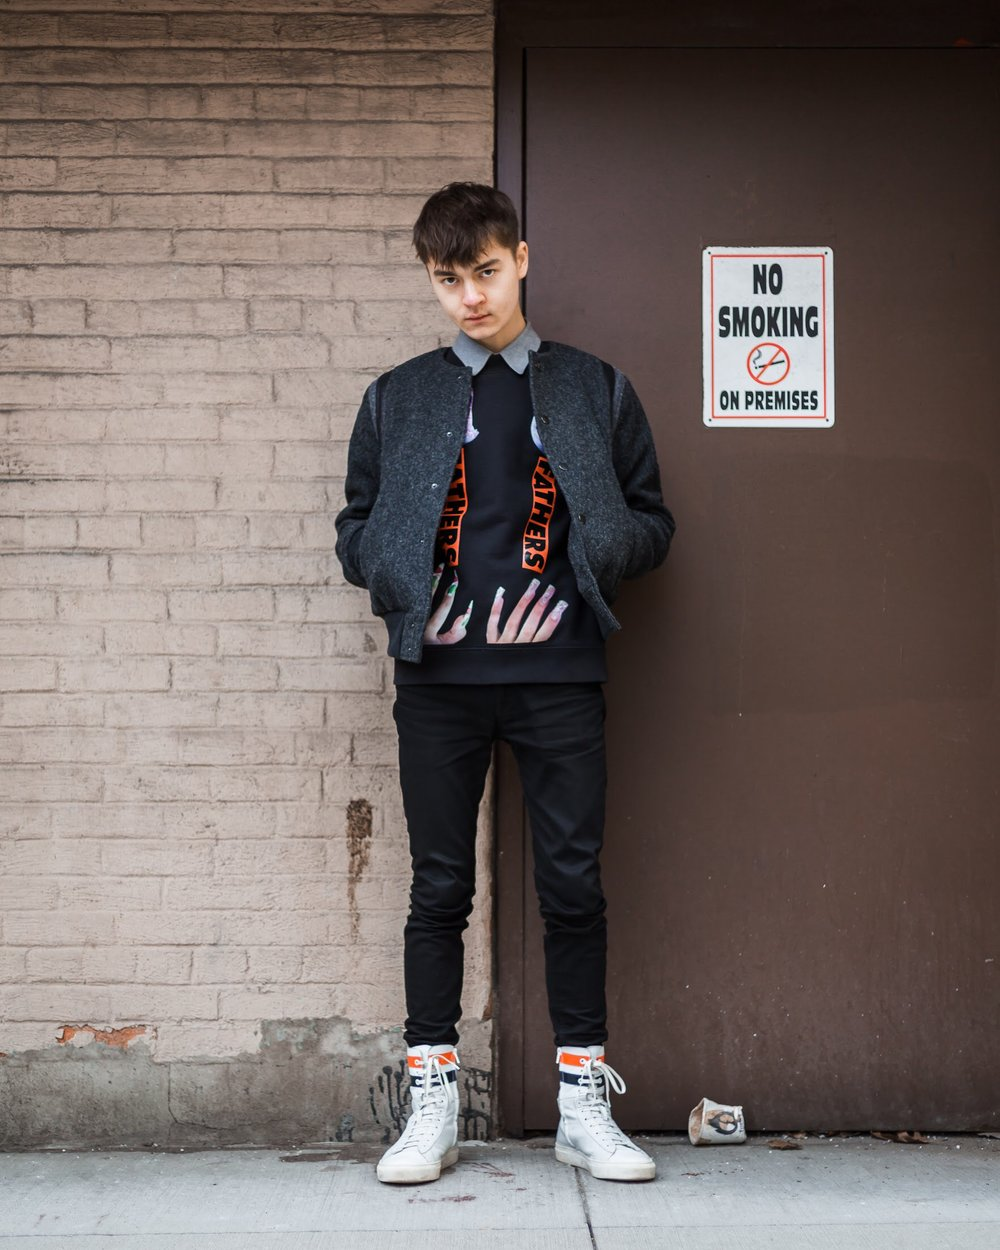 Wearing:   Dries Van Noten Jacket  Raf Simons x Sterling Ruby Sweater  Acne Studios Denim  Raf Simons Boots  Photo by Adam Zarowny